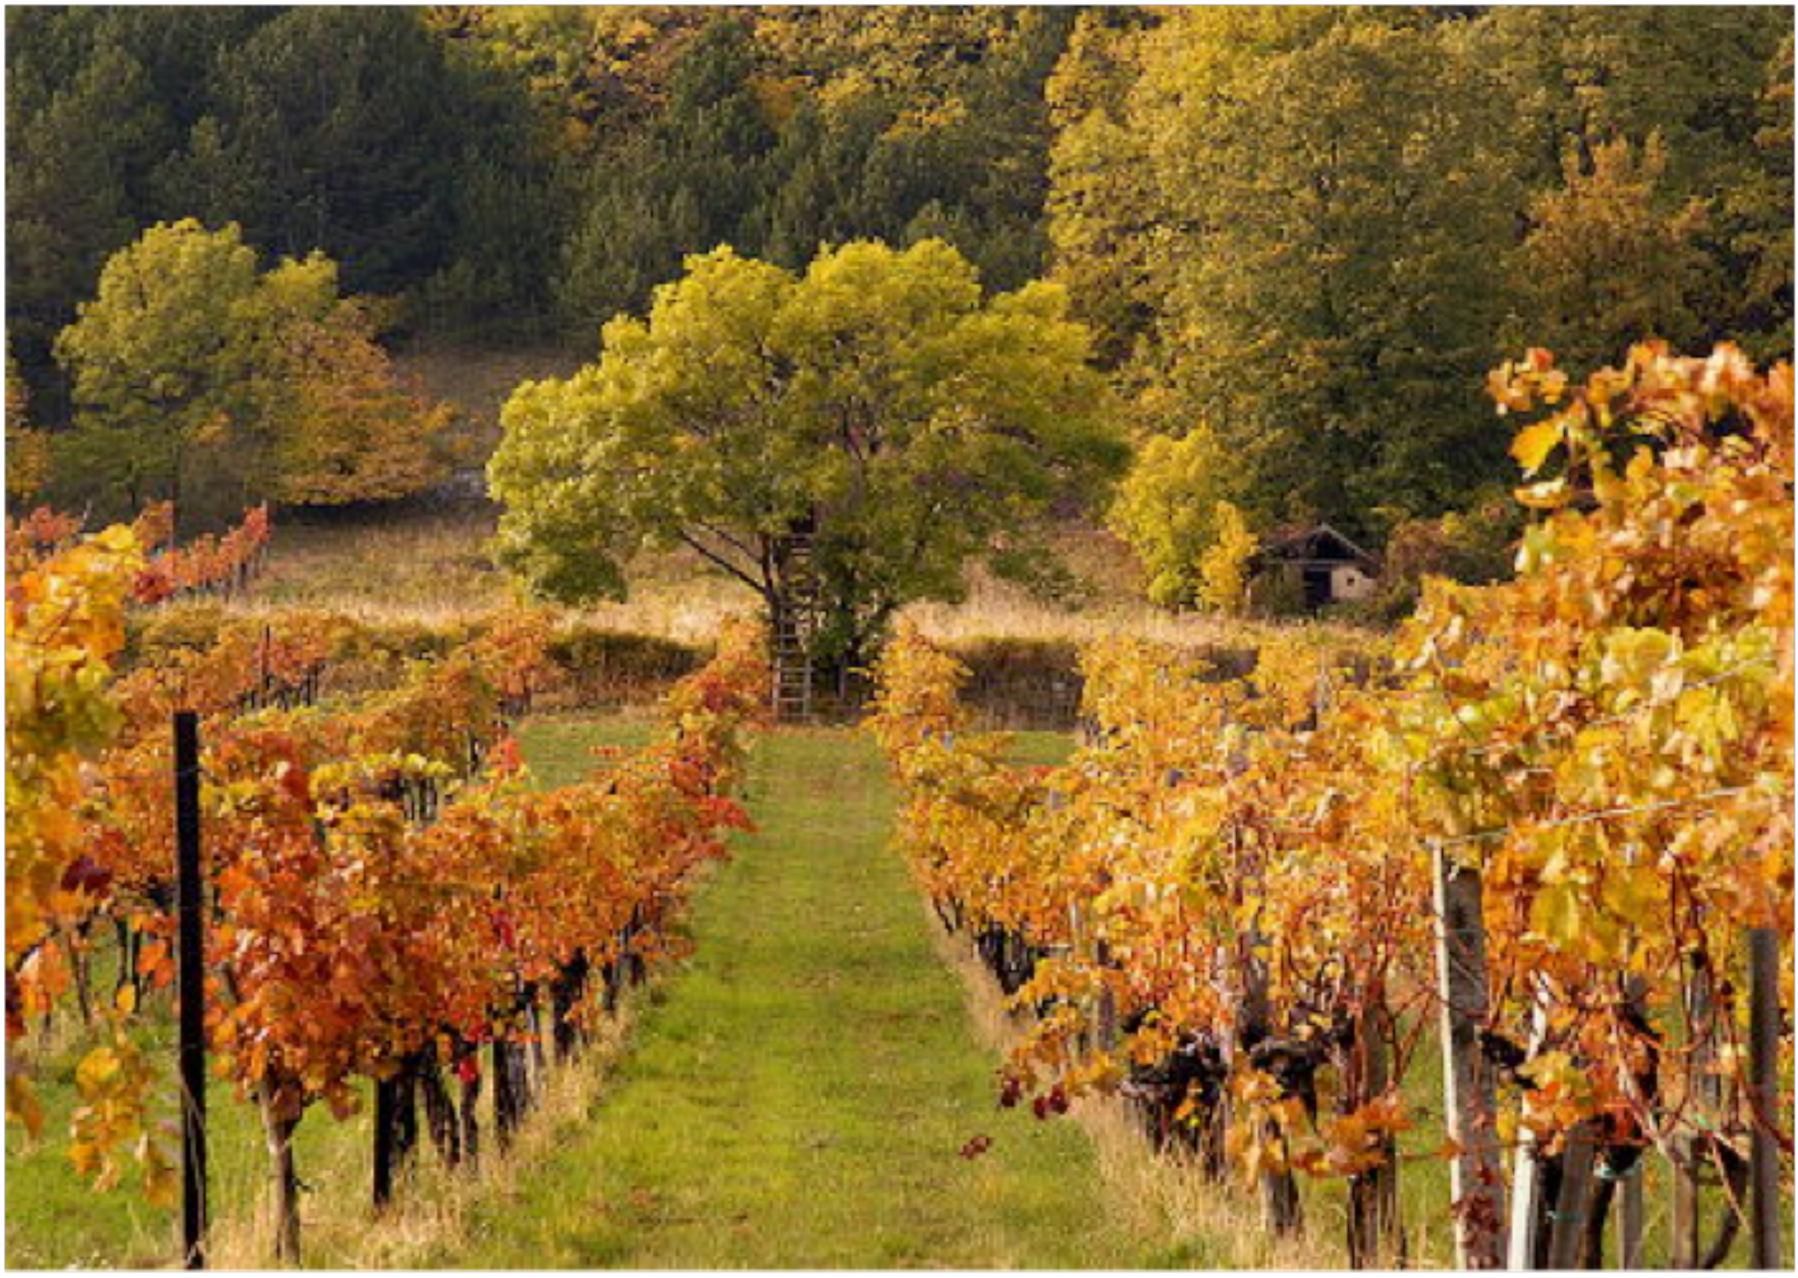 Transmontano - Vine to Wine CircleVine to Wine Circle